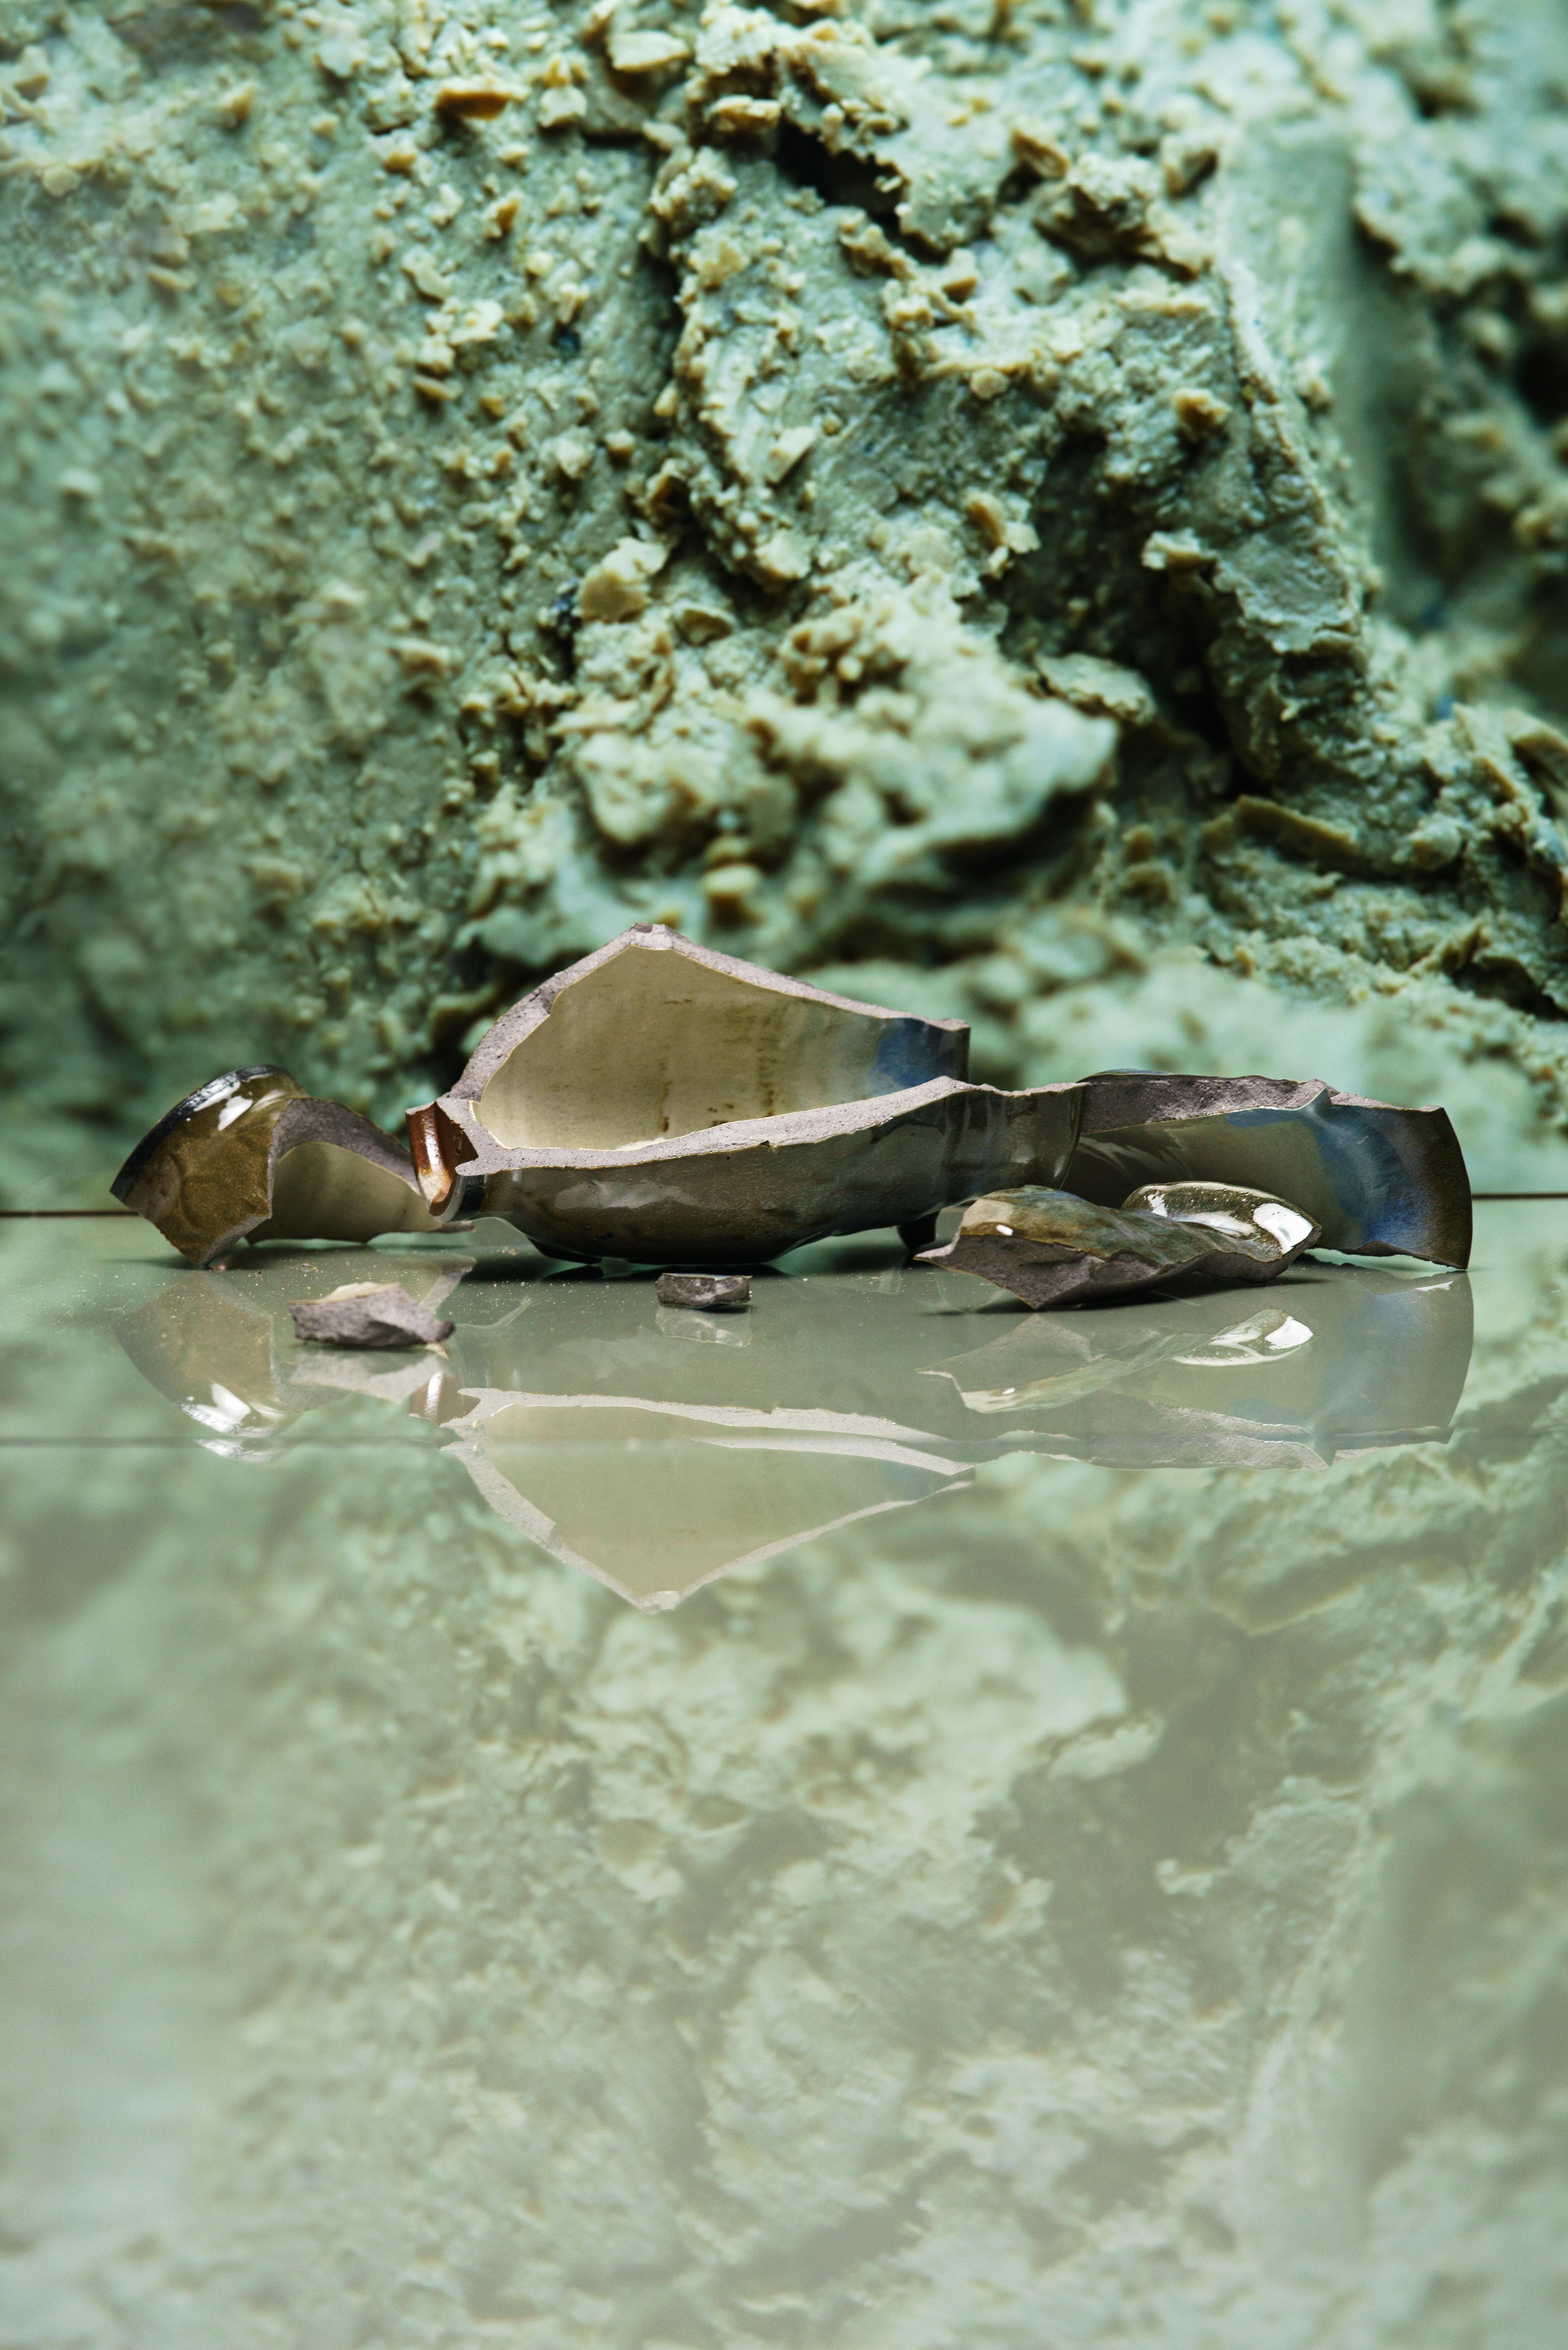 internal fragments